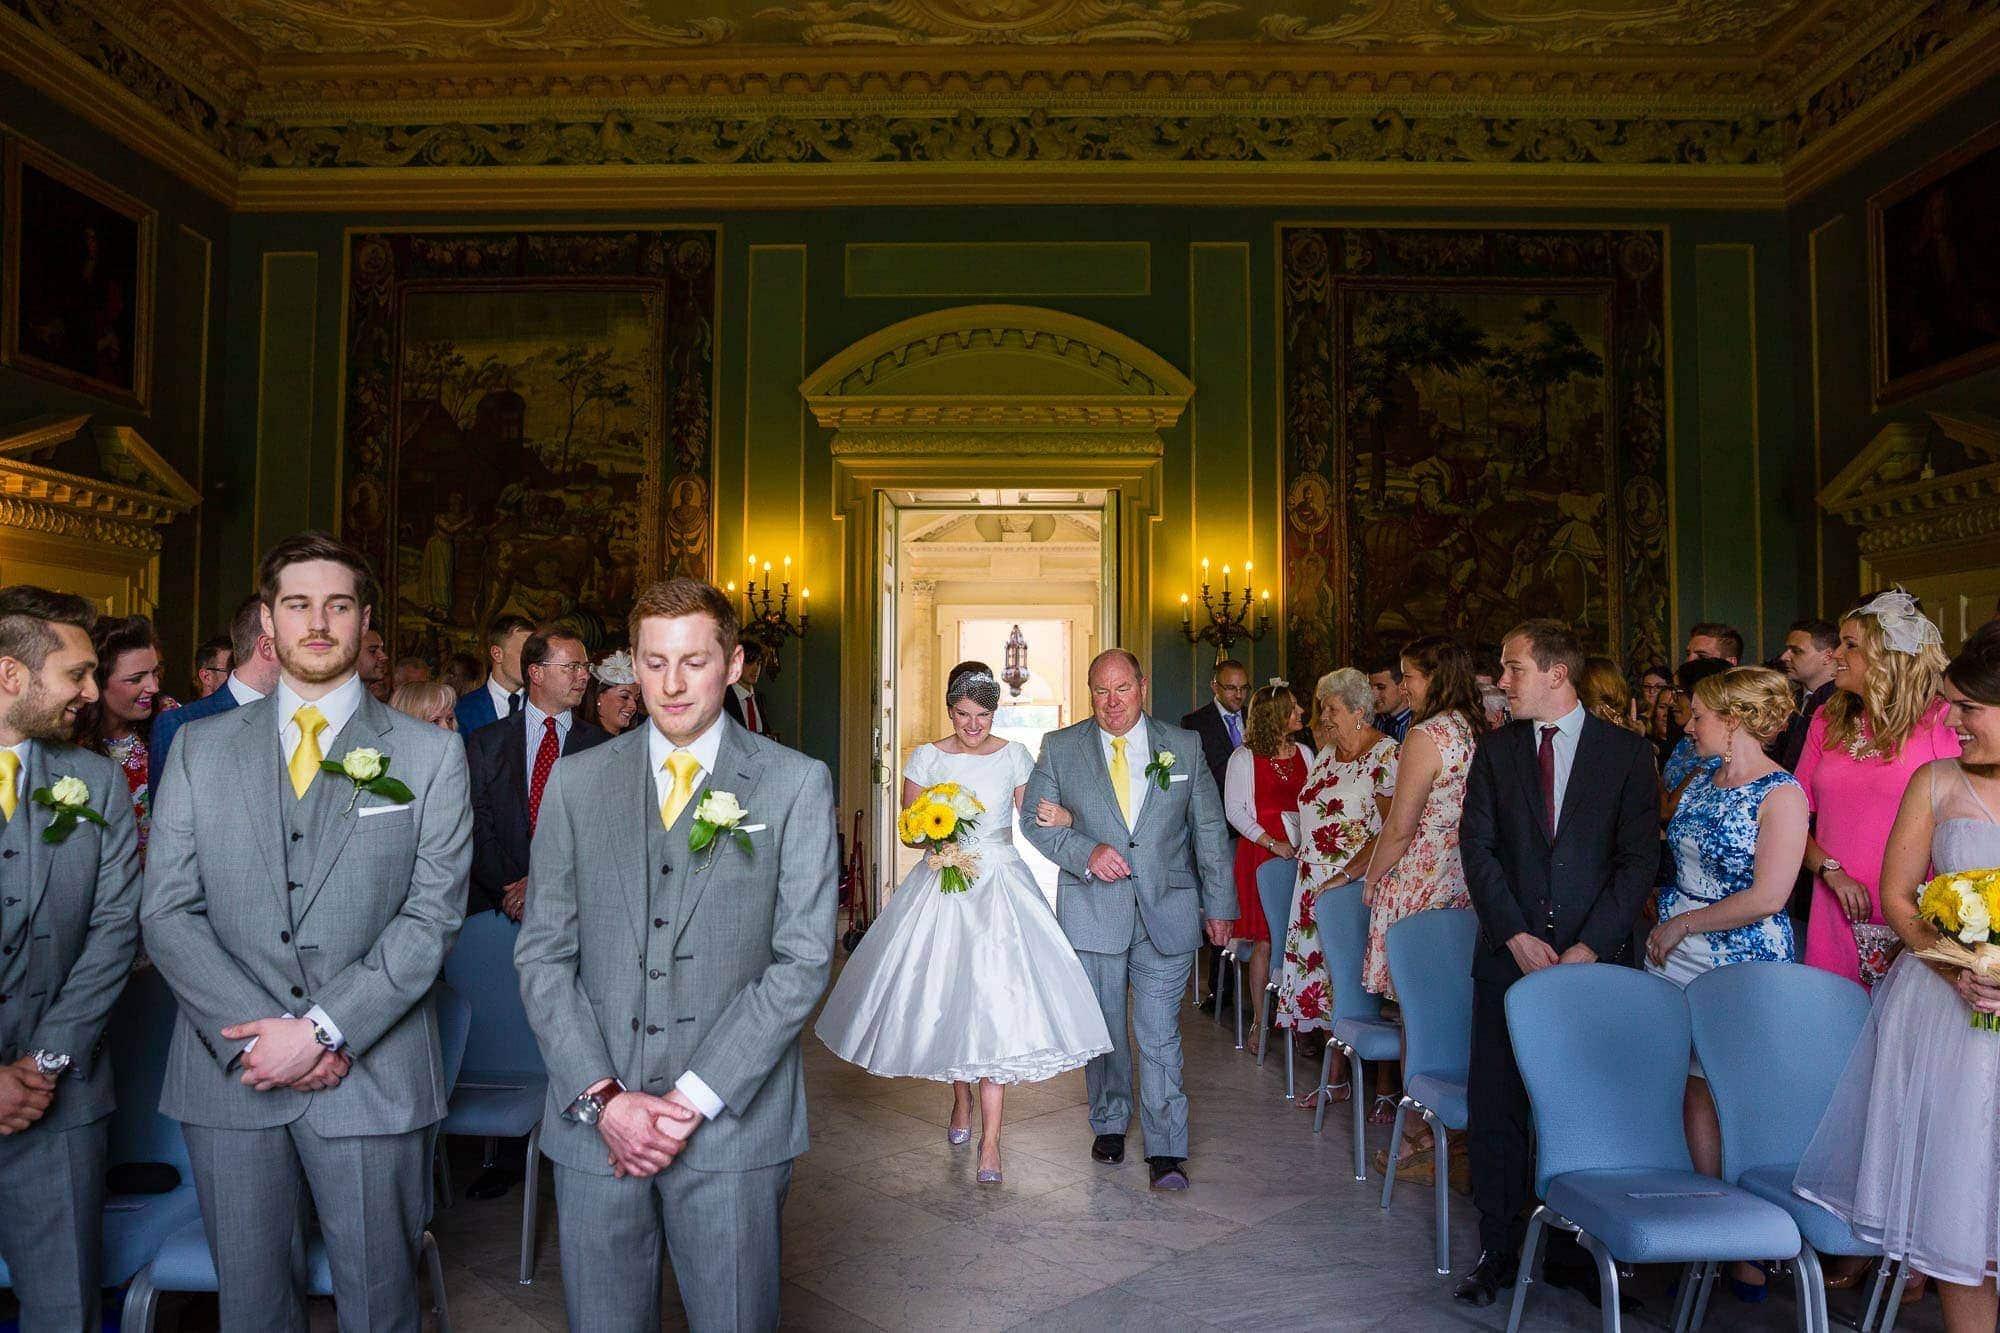 Clandon Park Wedding Photographer 41 5459